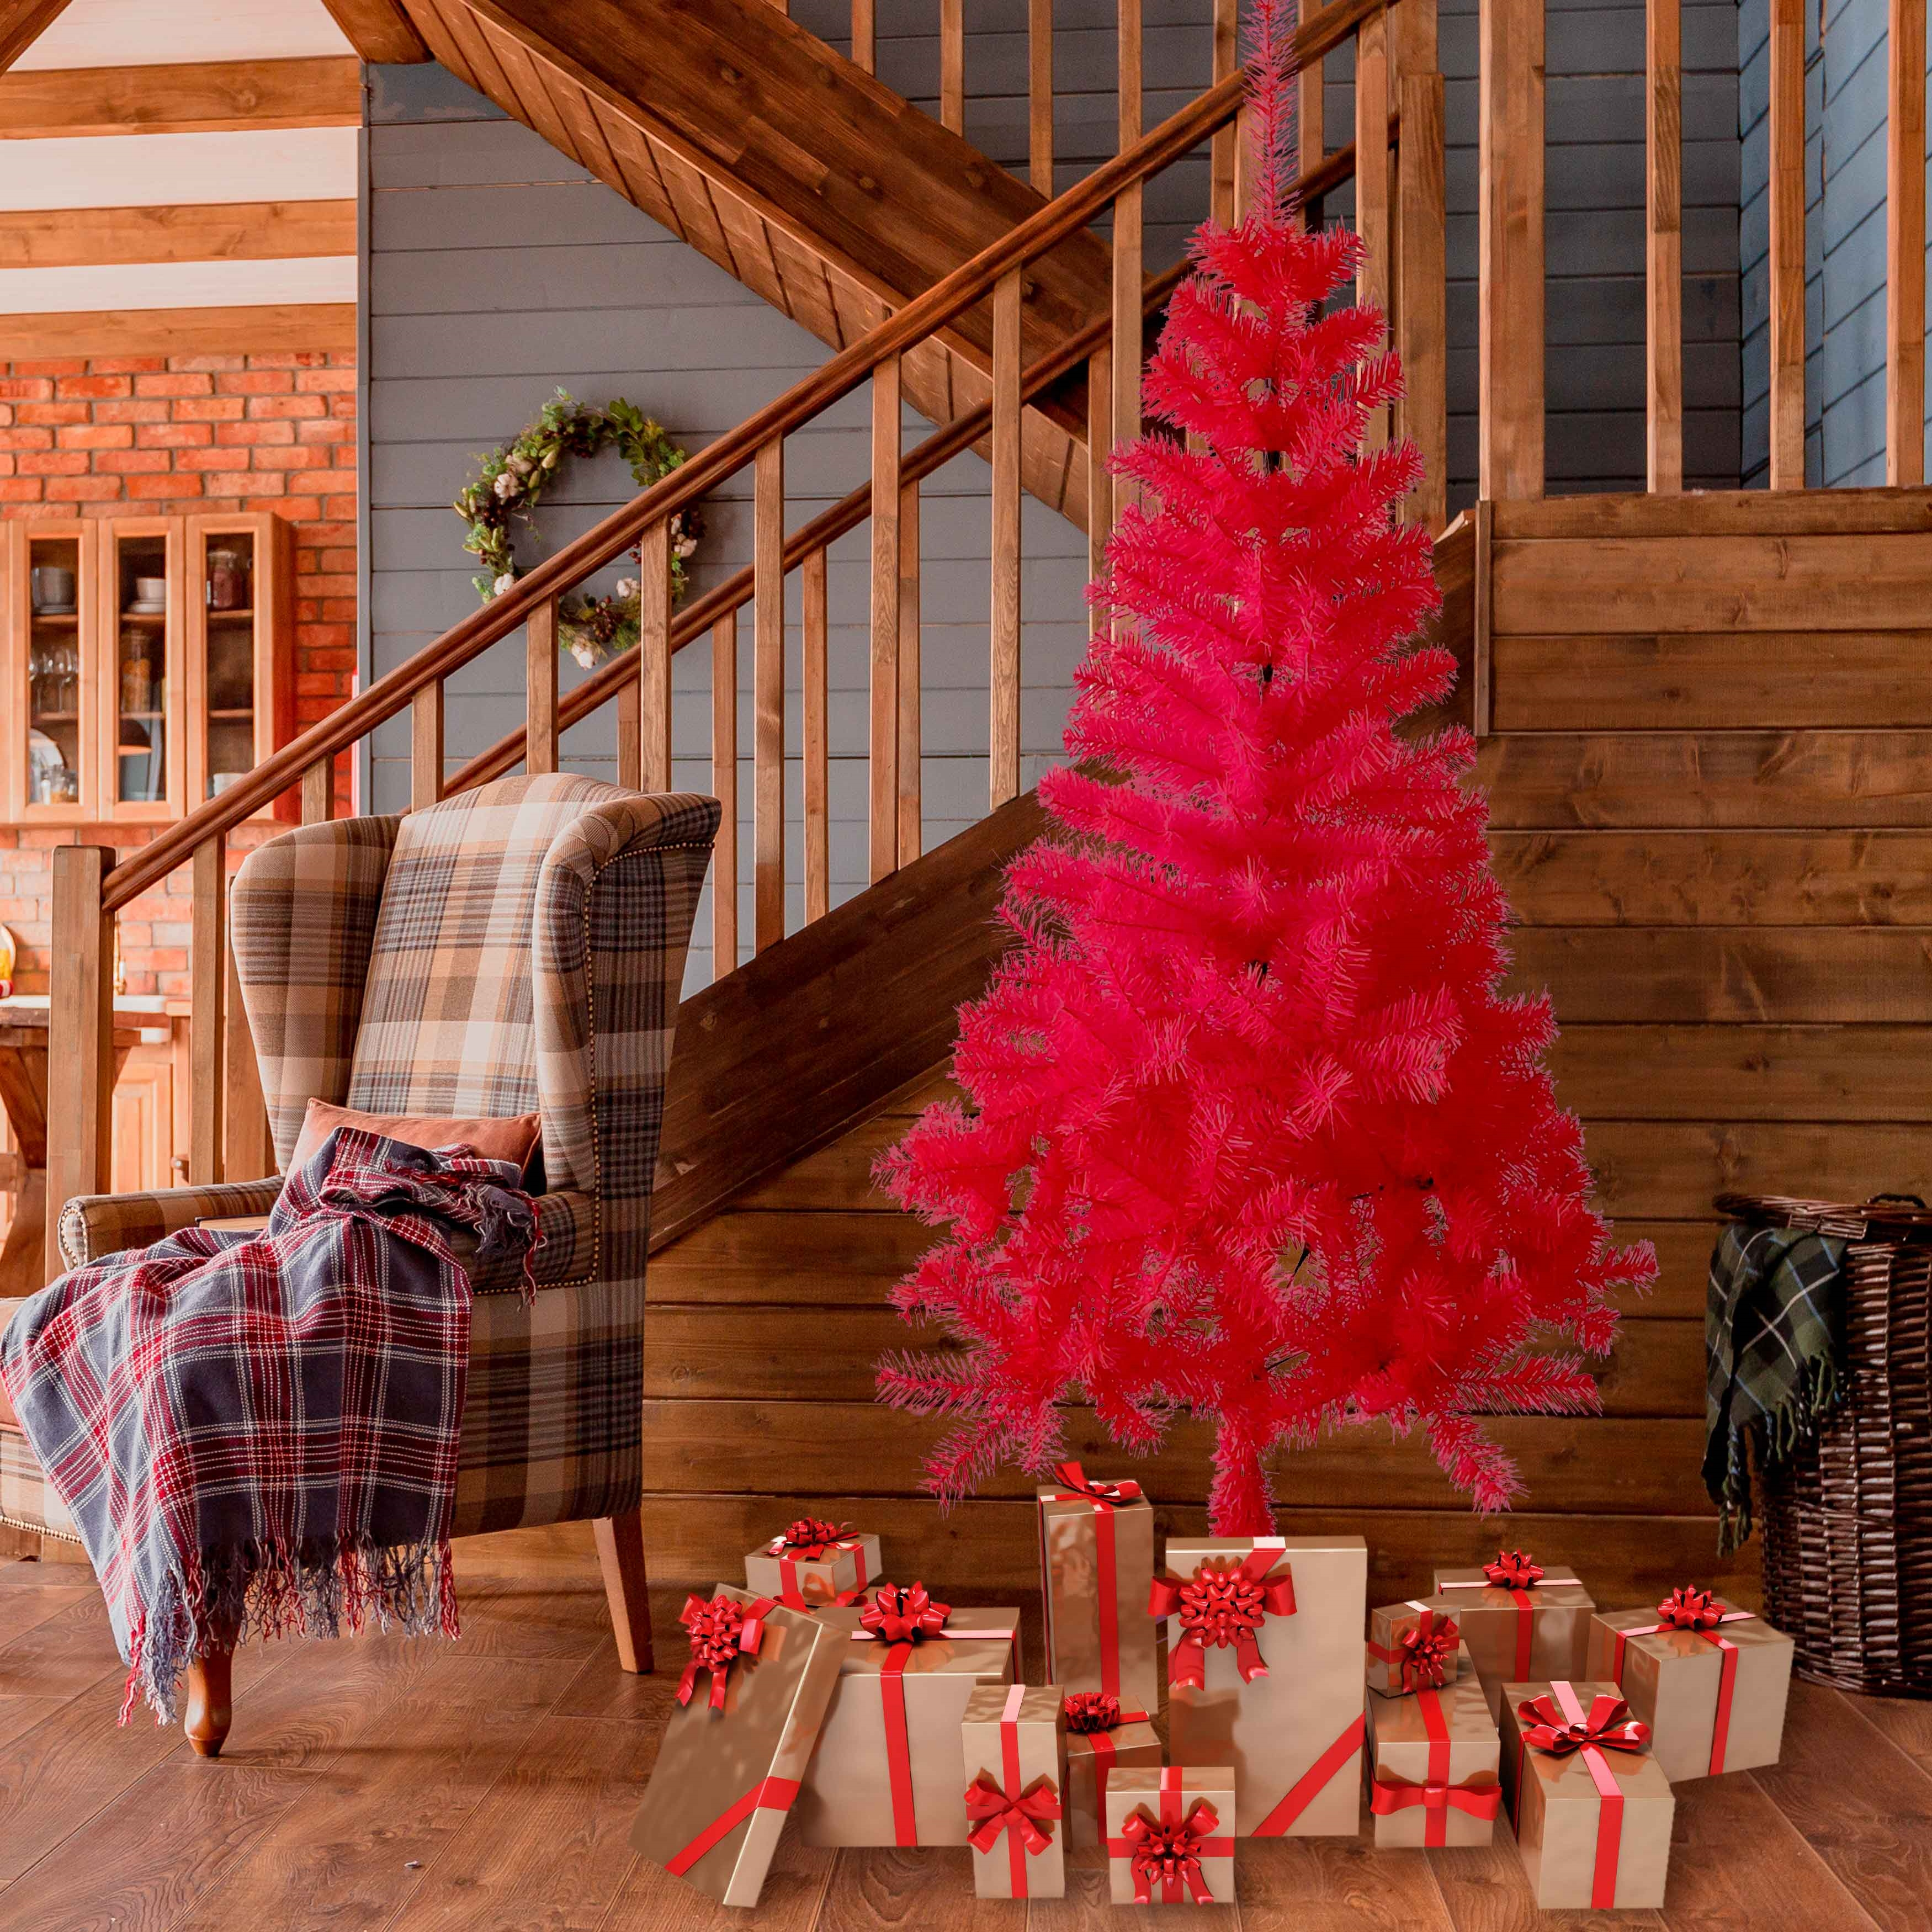 Aleko Artificial Indoor Christmas Holiday Tree 5 Foot Candy Cane Color 655222809018 Ebay